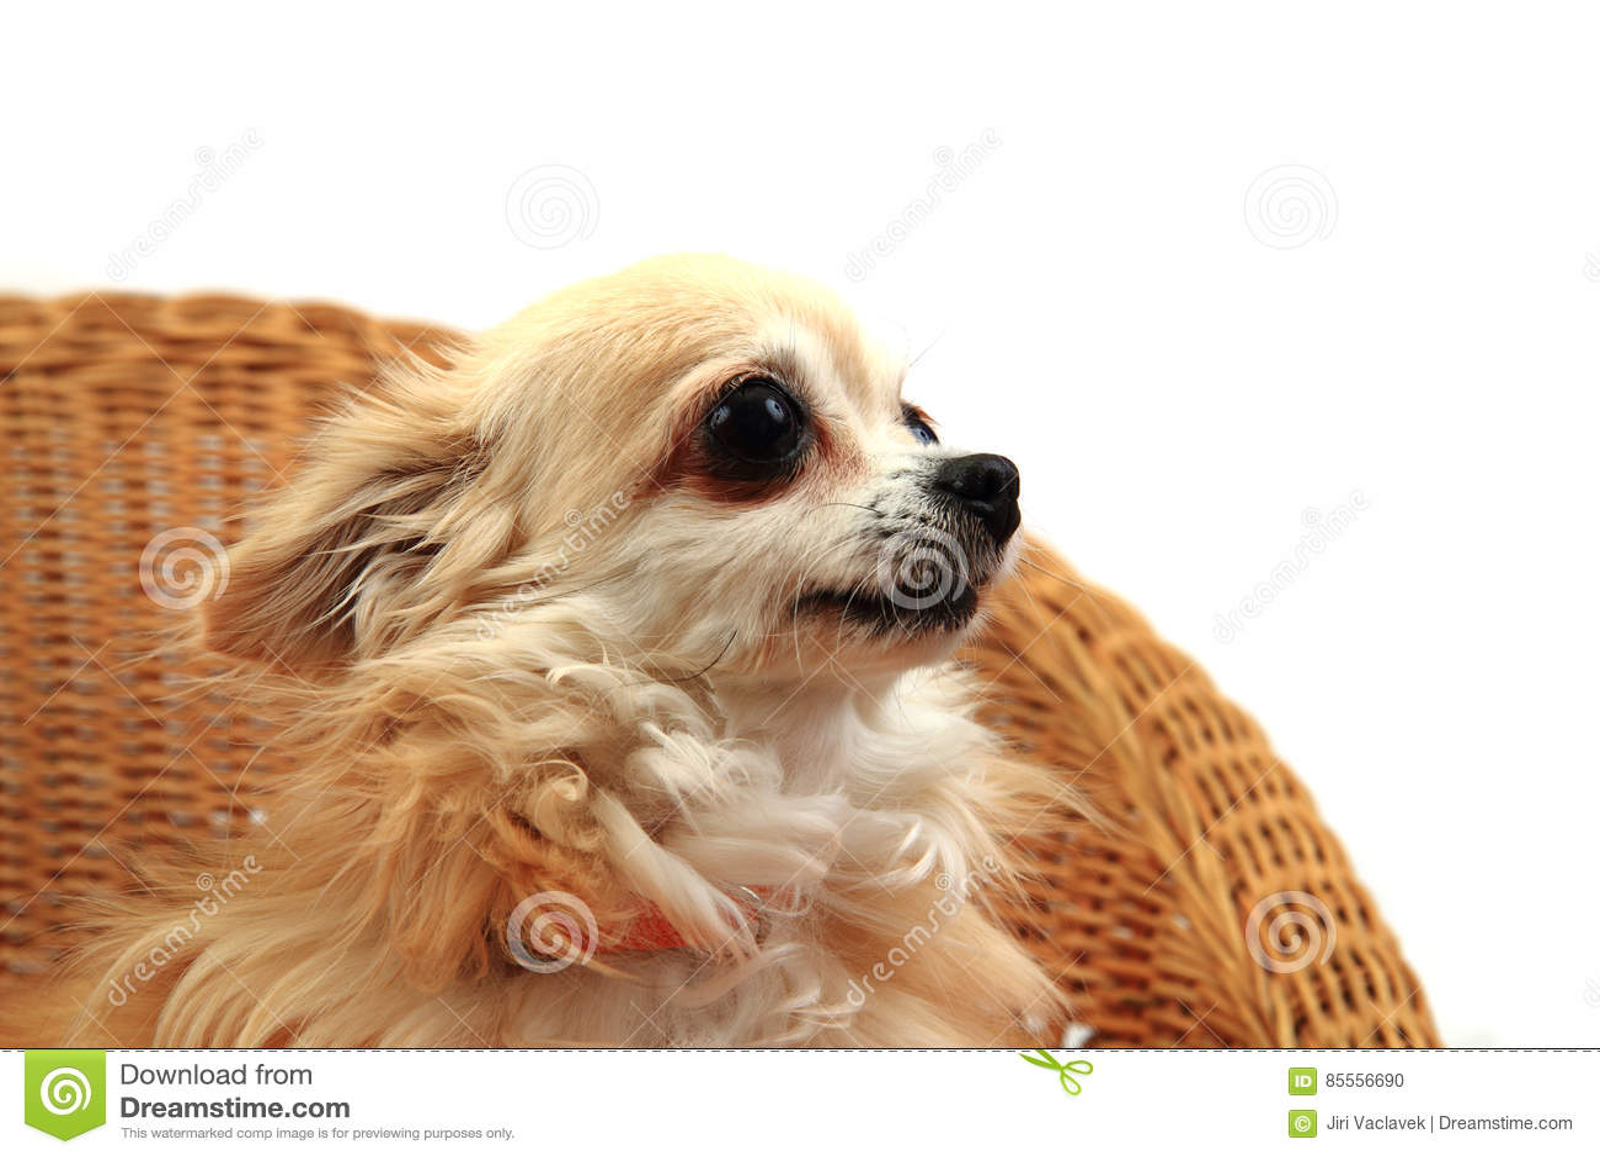 Chihuahua stehen still